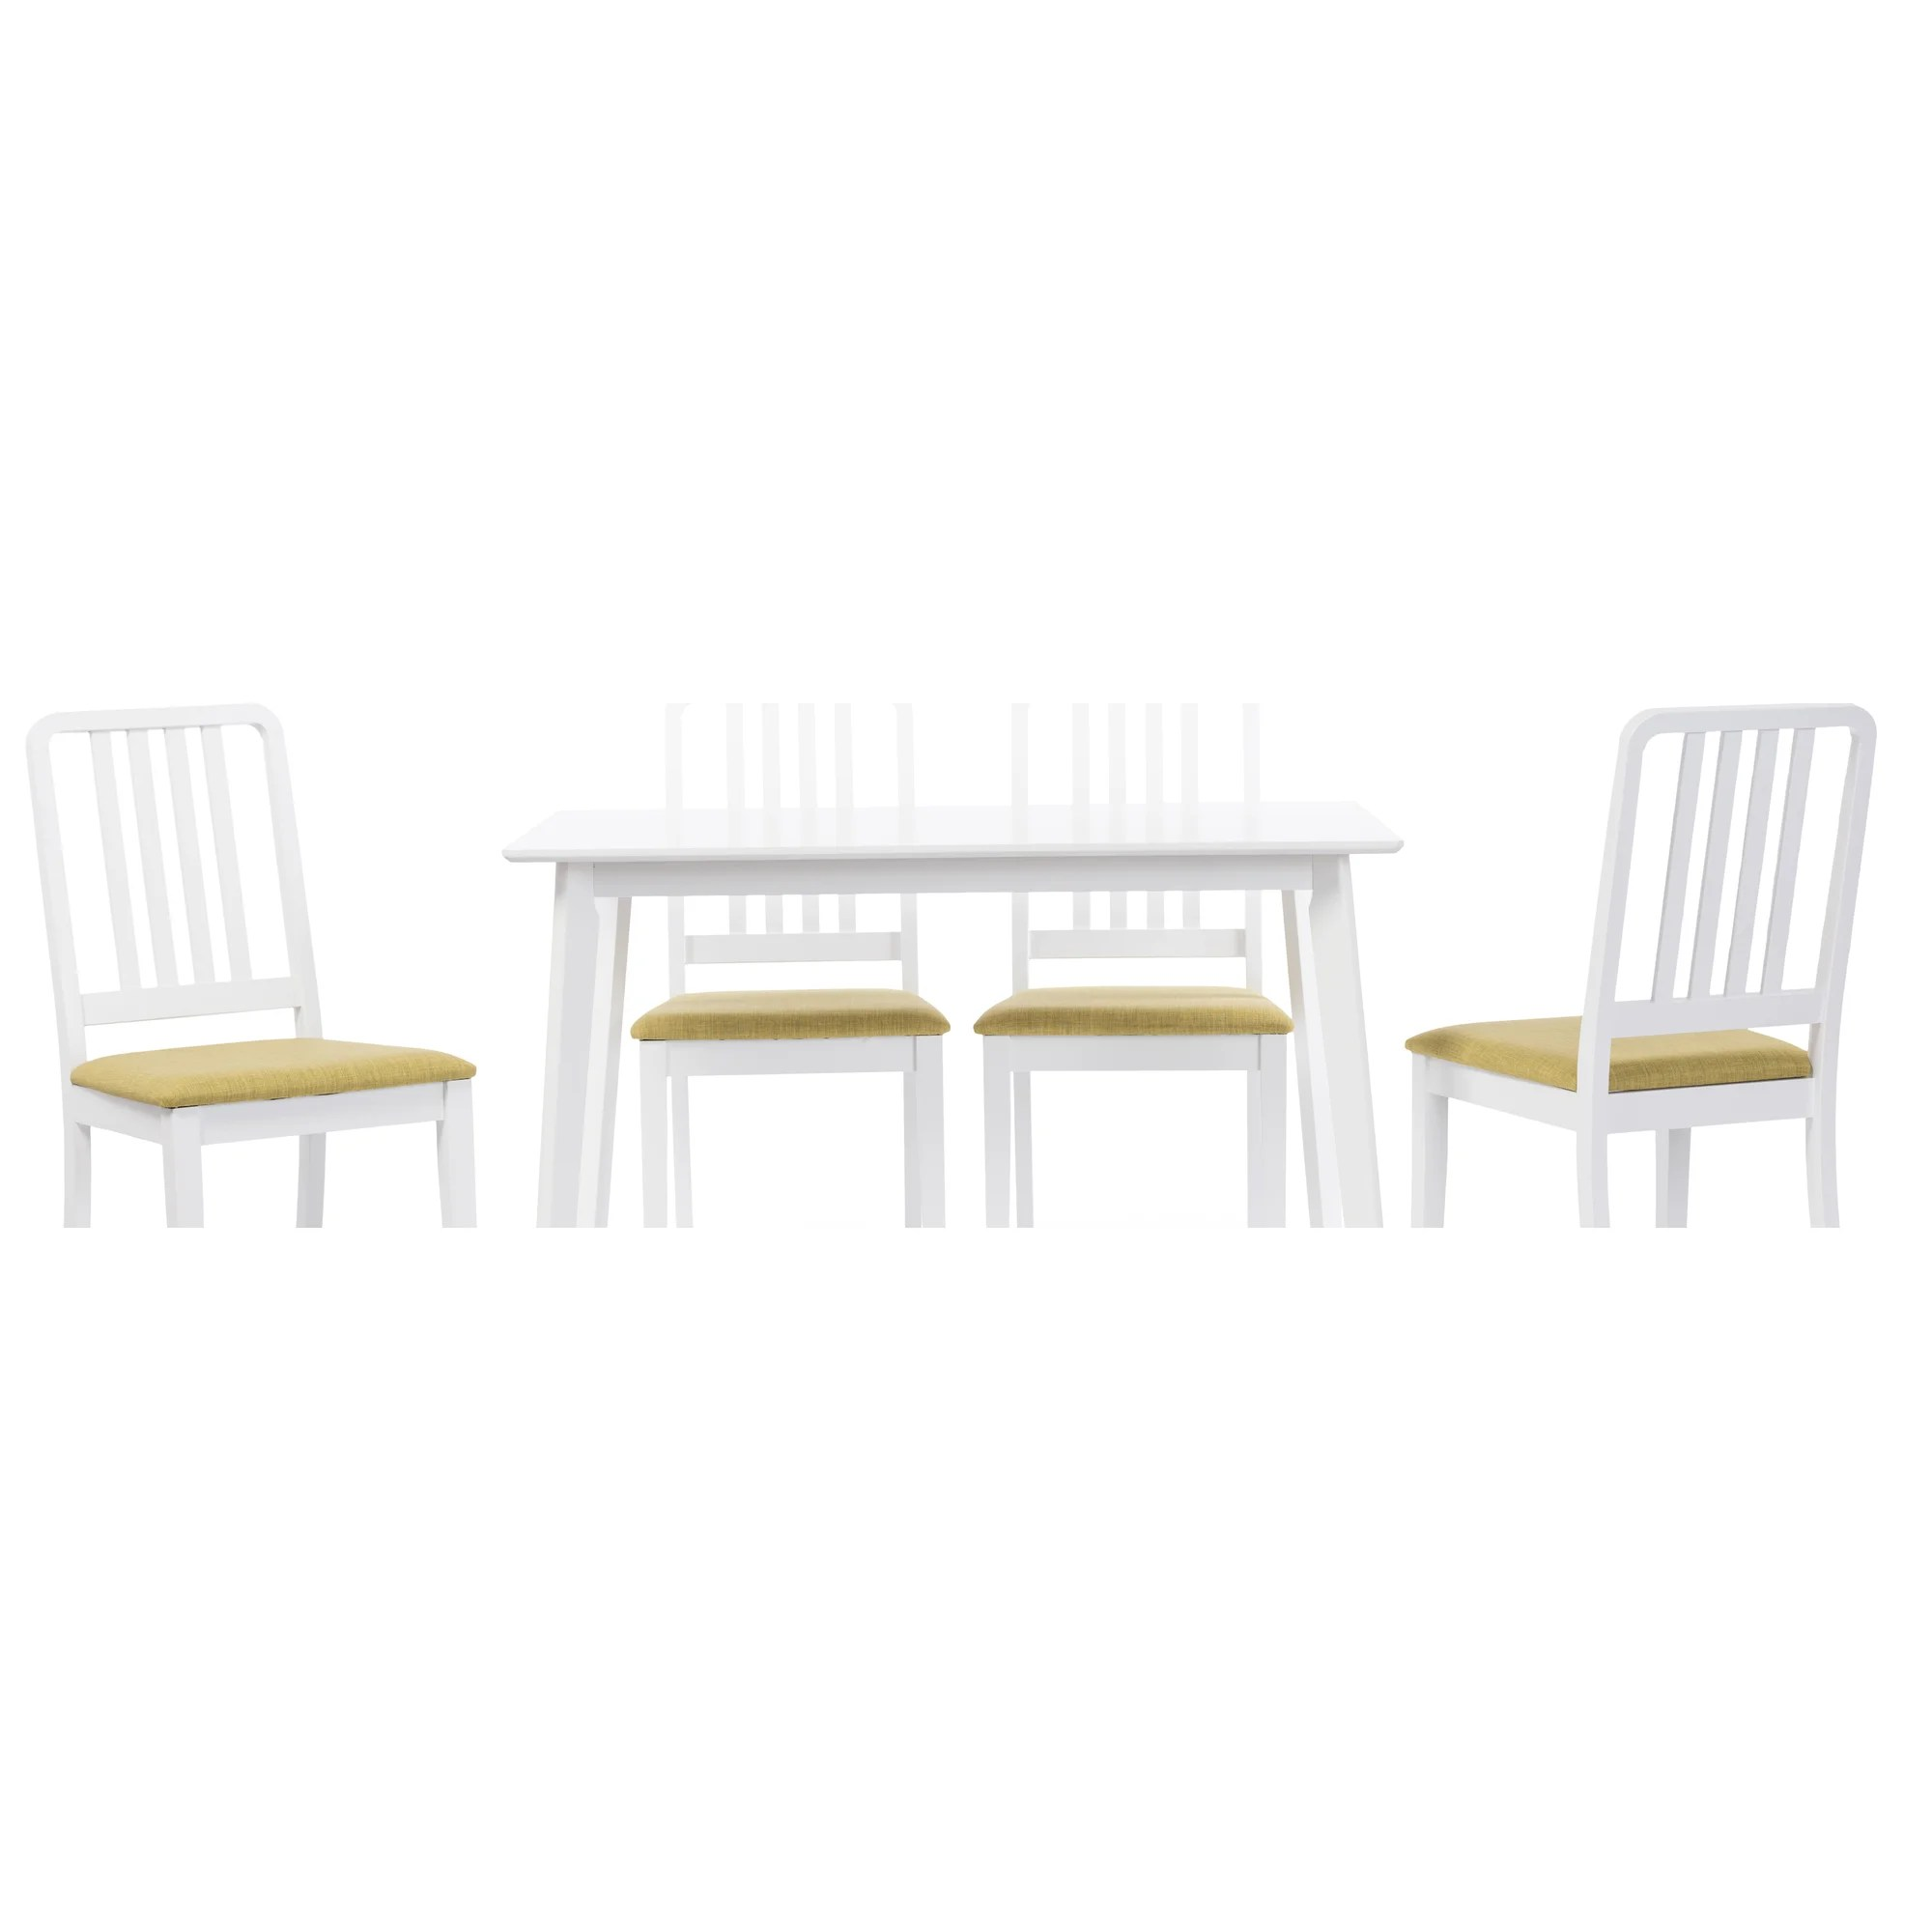 Wholesale Interiors Baxton Studio Baxton Dining Chair